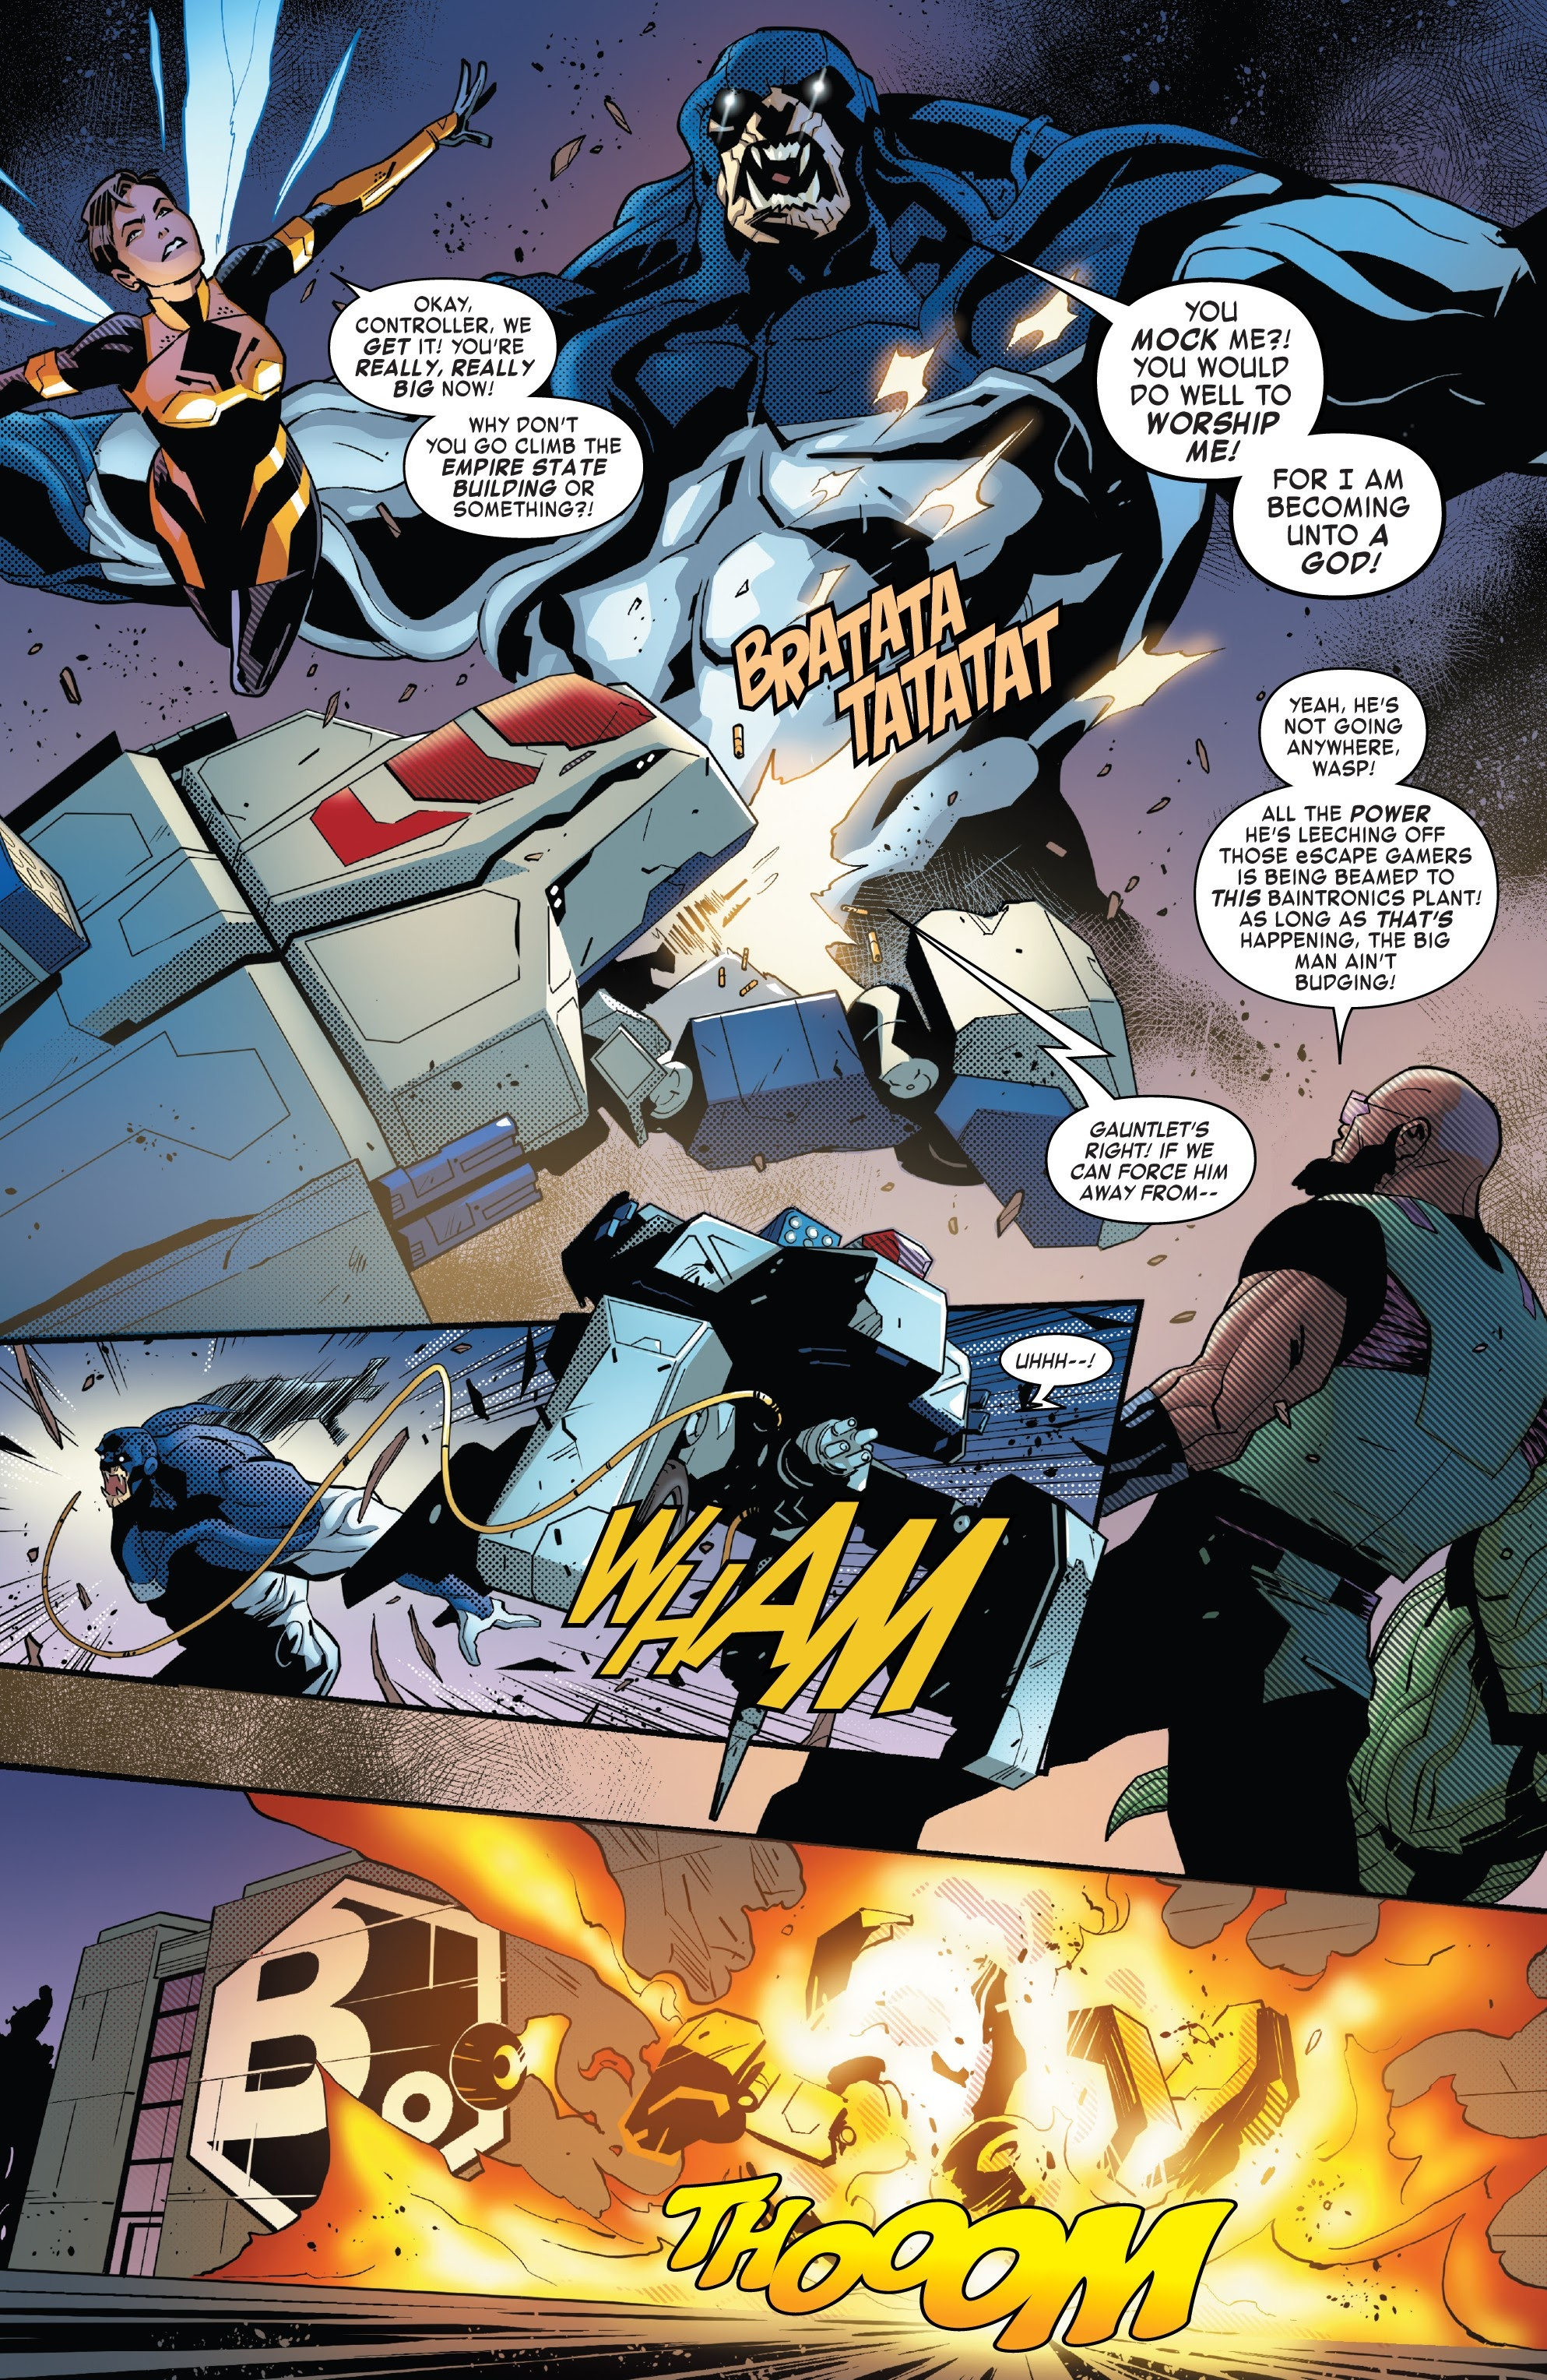 Read online Tony Stark: Iron Man comic -  Issue #10 - 13